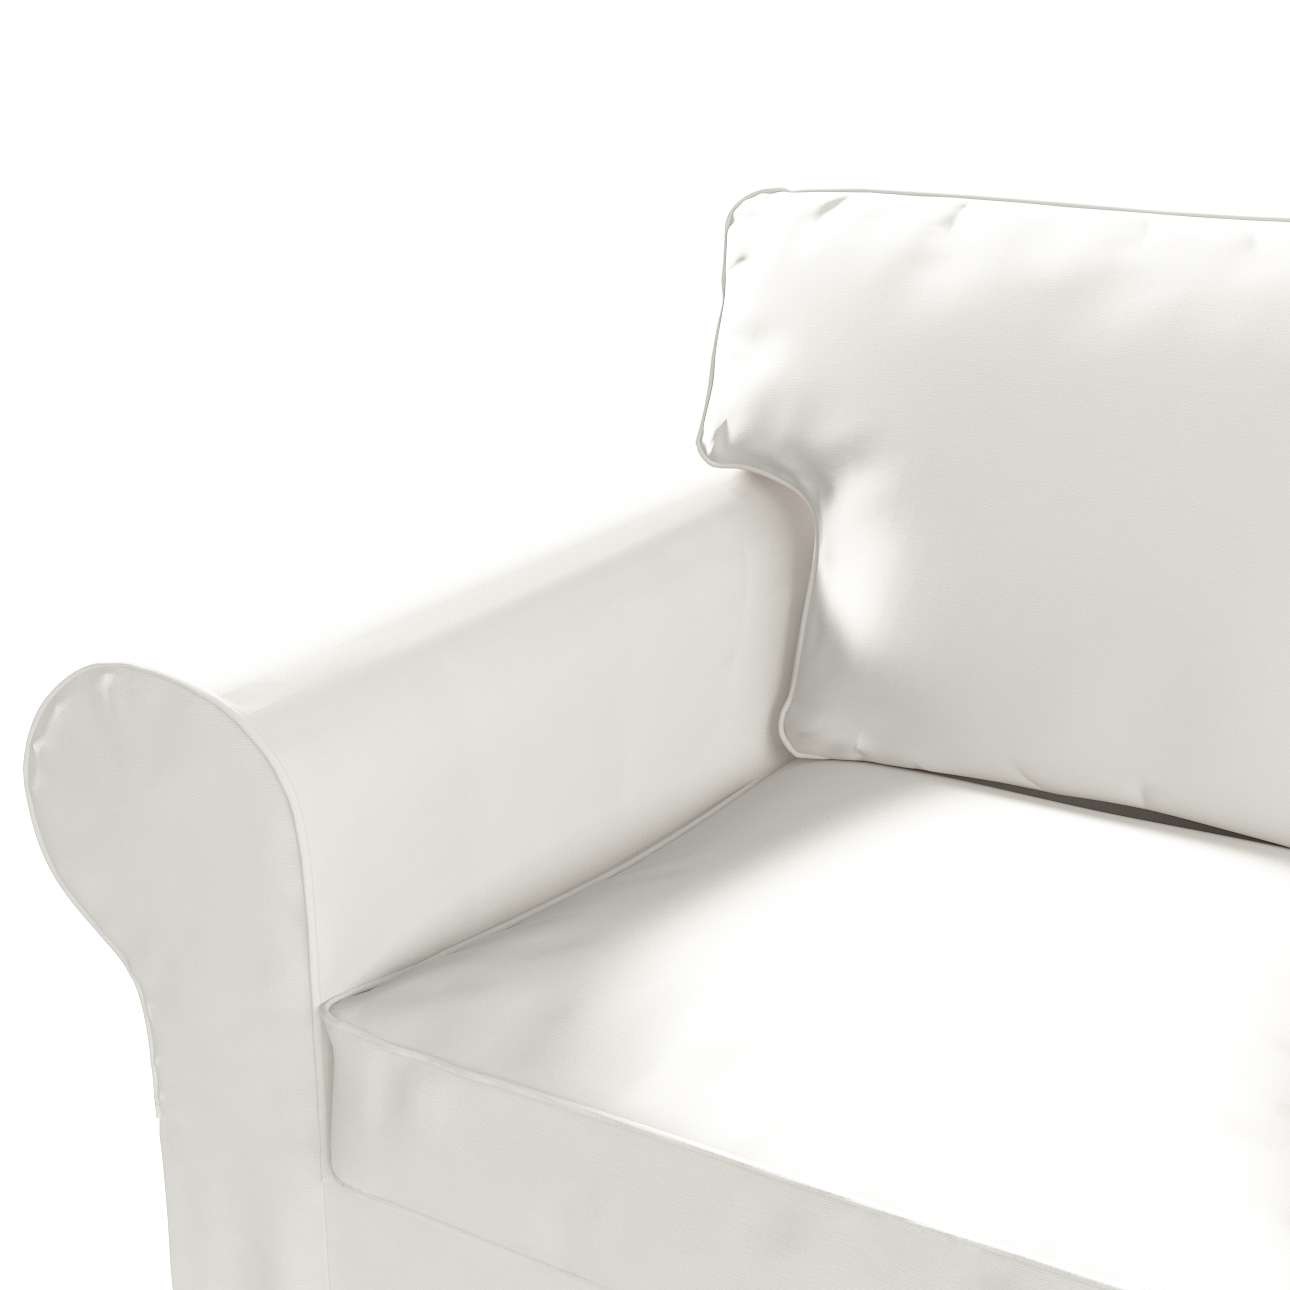 Ektorp 3-Sitzer Schlafsofabezug neues Modell (2013) Ektorp 3-Sitzer, ausklappbar, neues Modell ( 2013) von der Kollektion Cotton Panama, Stoff: 702-34